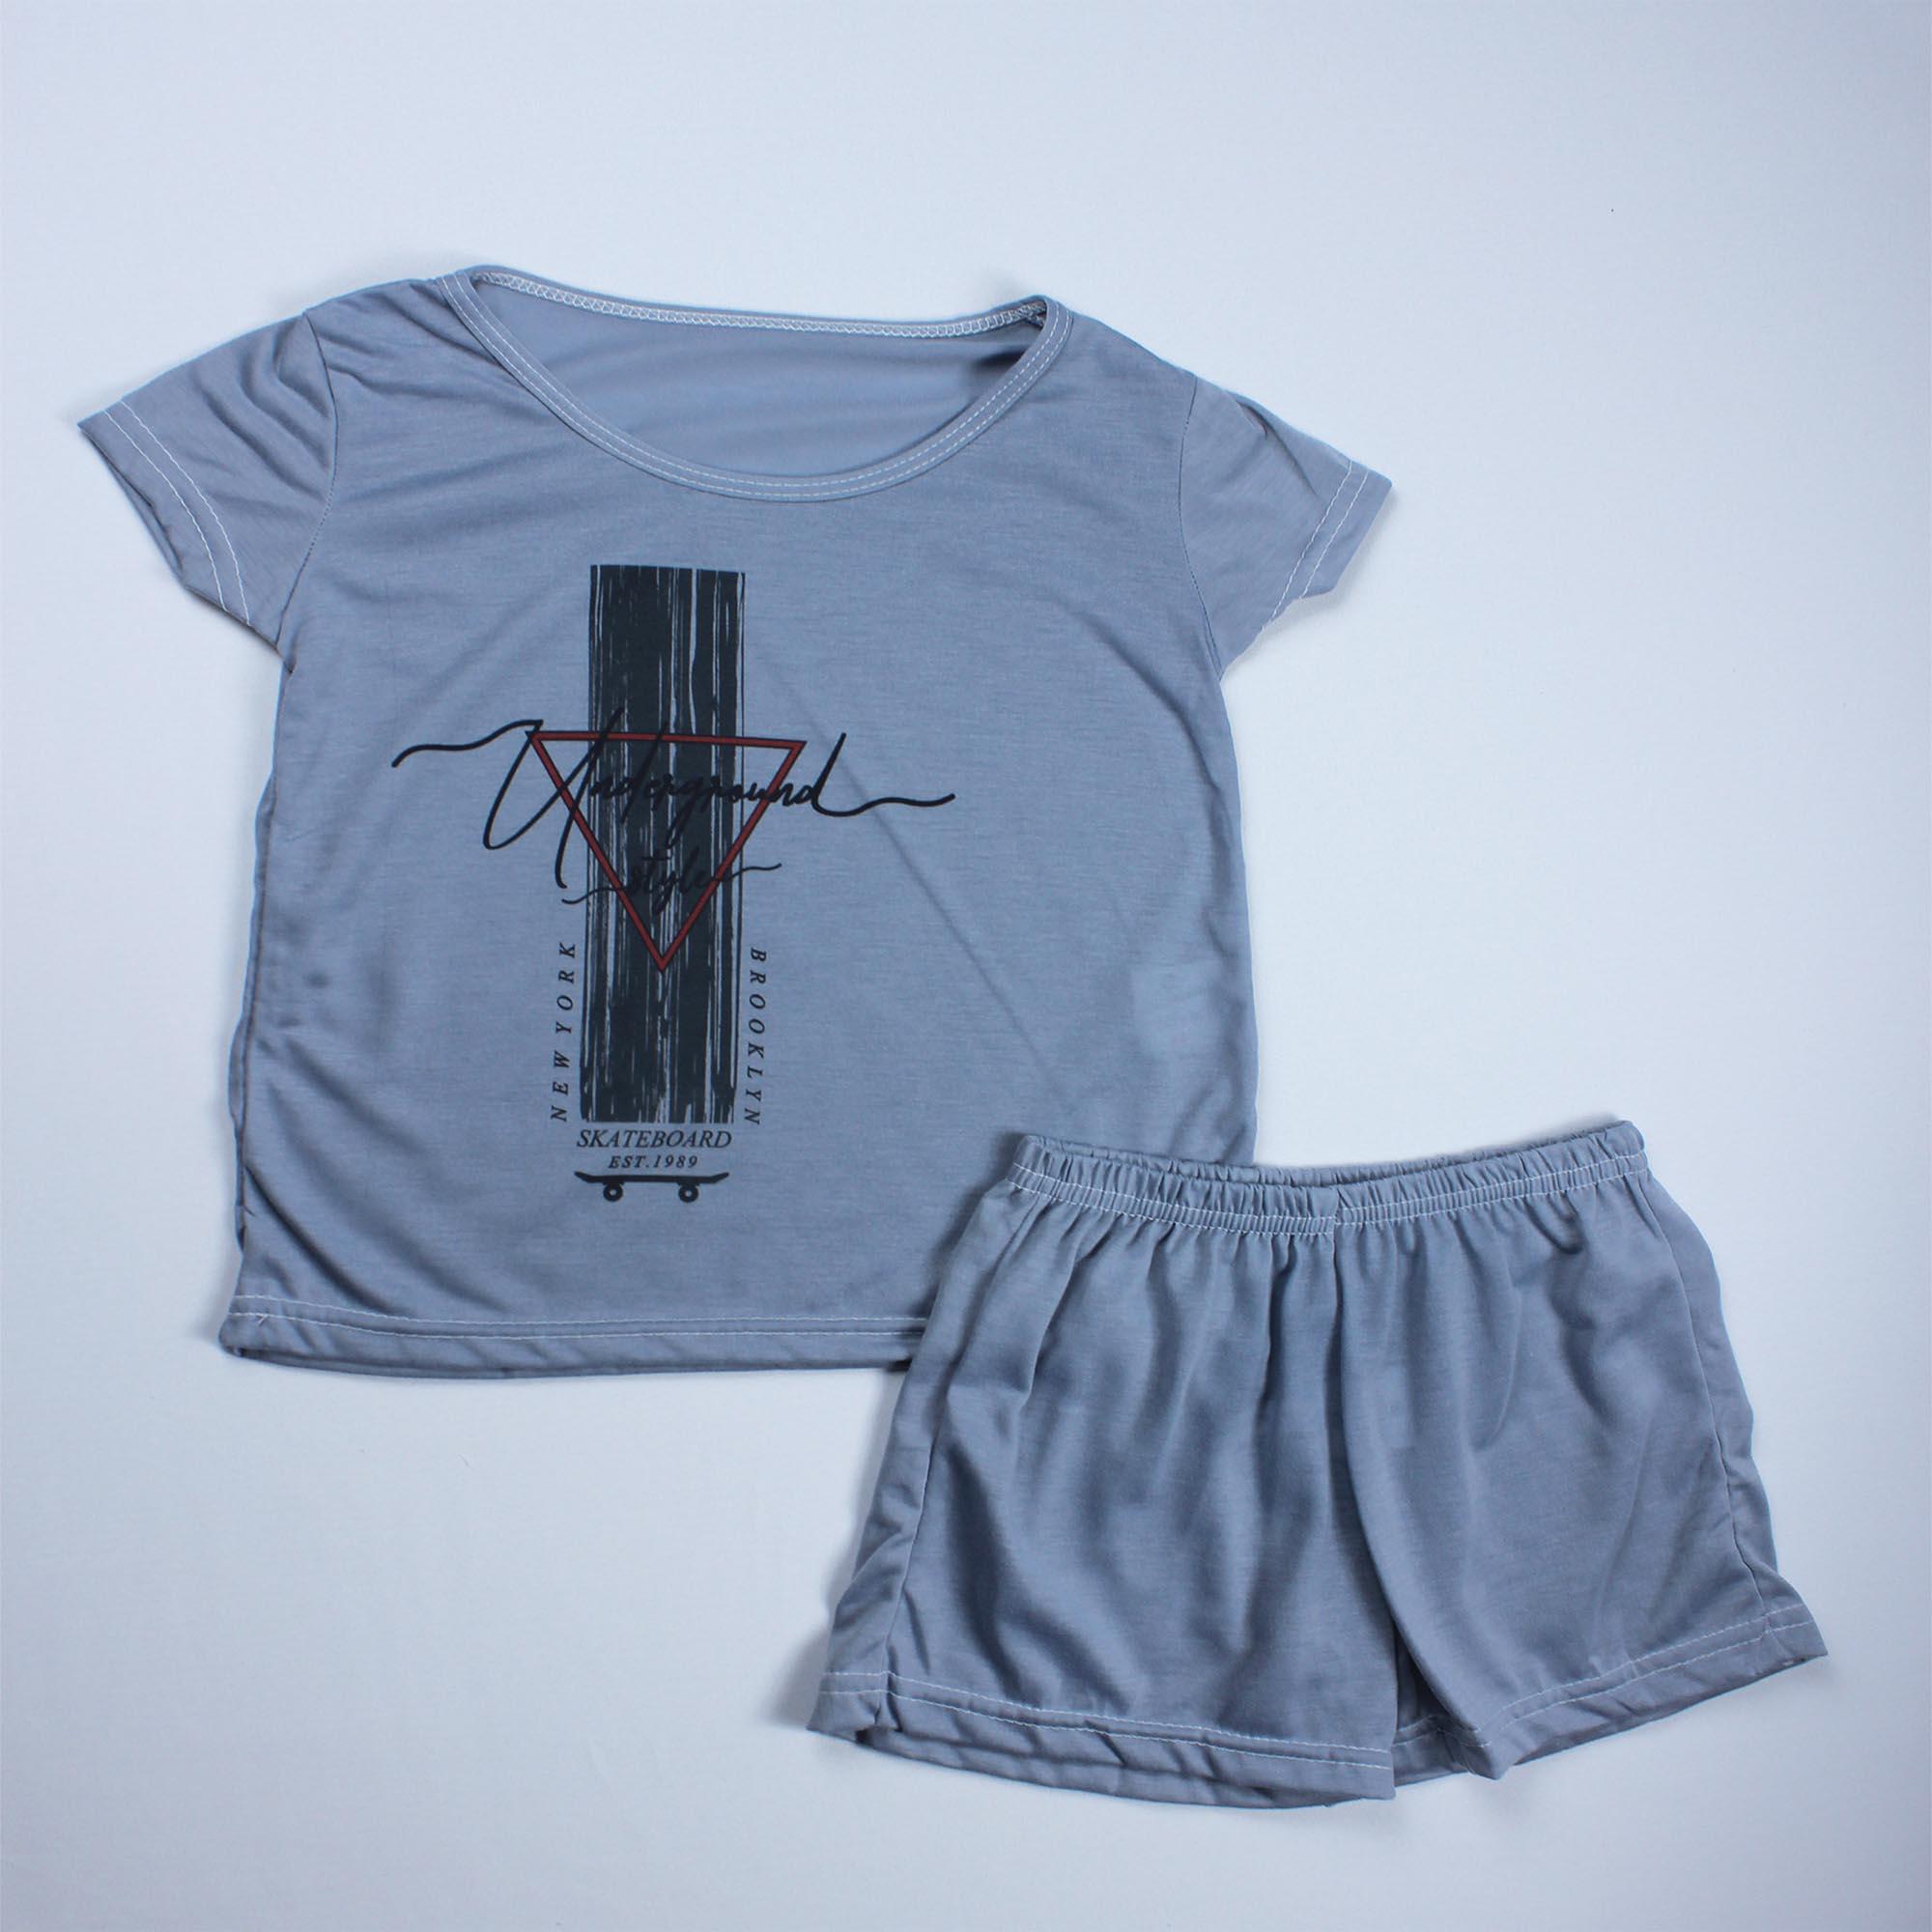 Pijama Infantil Menino - Tamanho 10